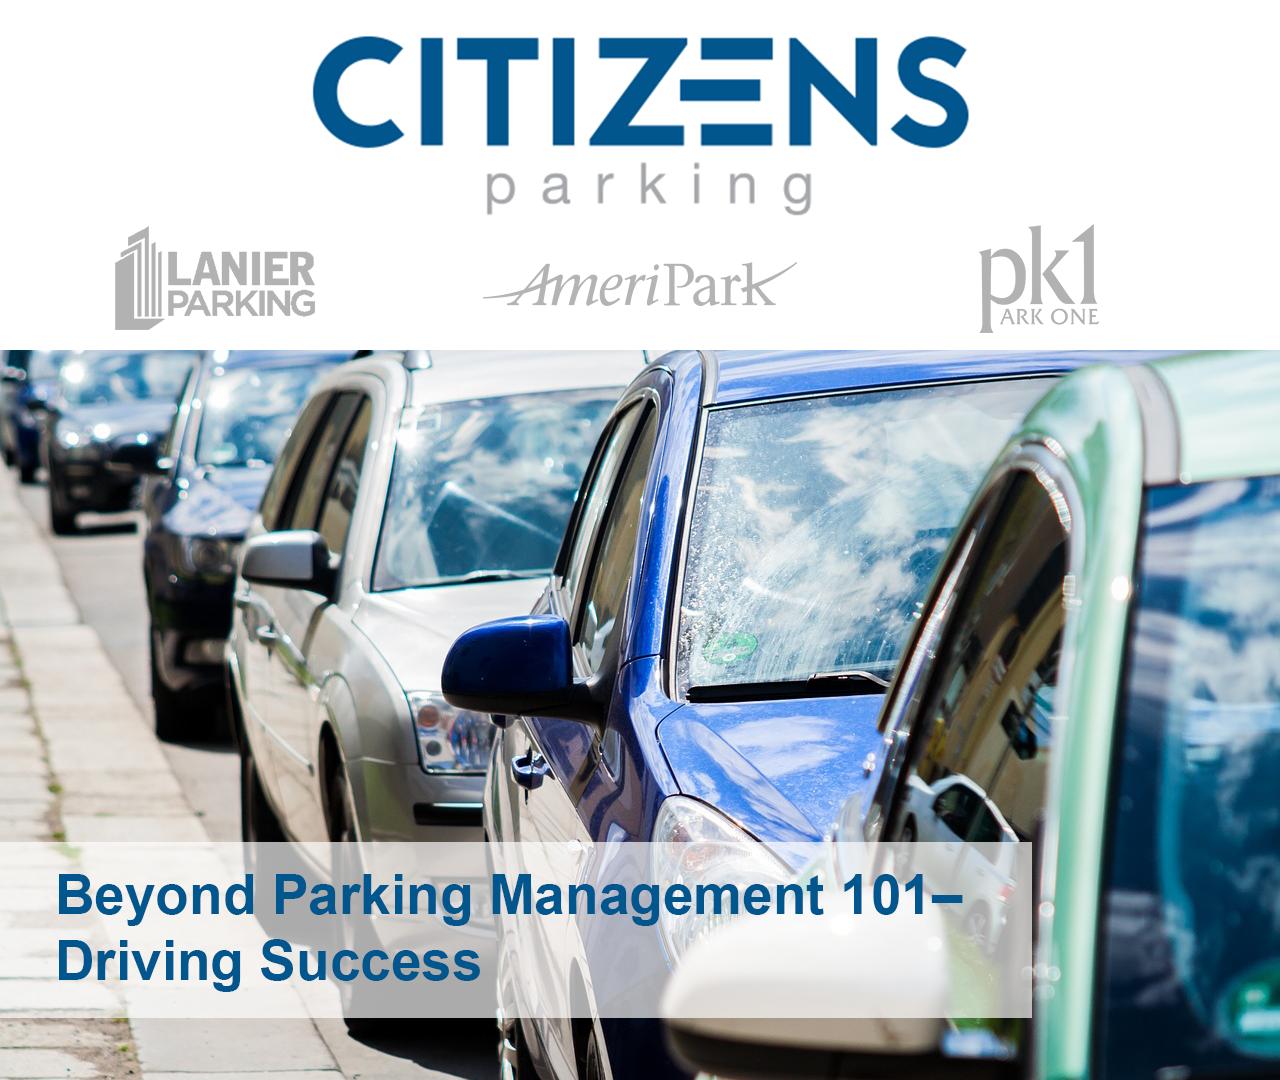 Beyond Parking Management 101–Driving Success!